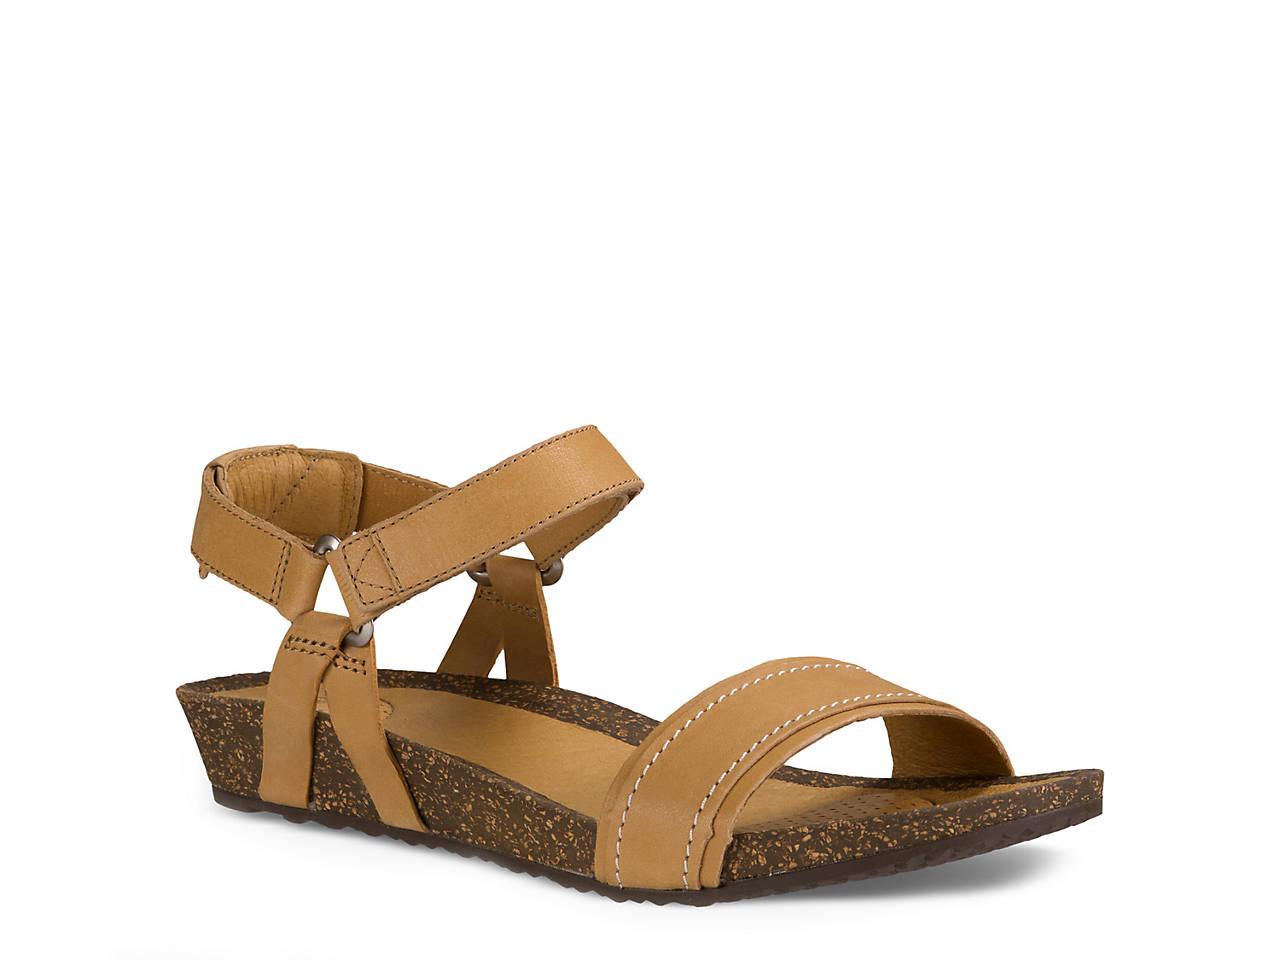 0c1da9683d7a78 Teva Ysidro Stitch Flat Sandal Women s Shoes